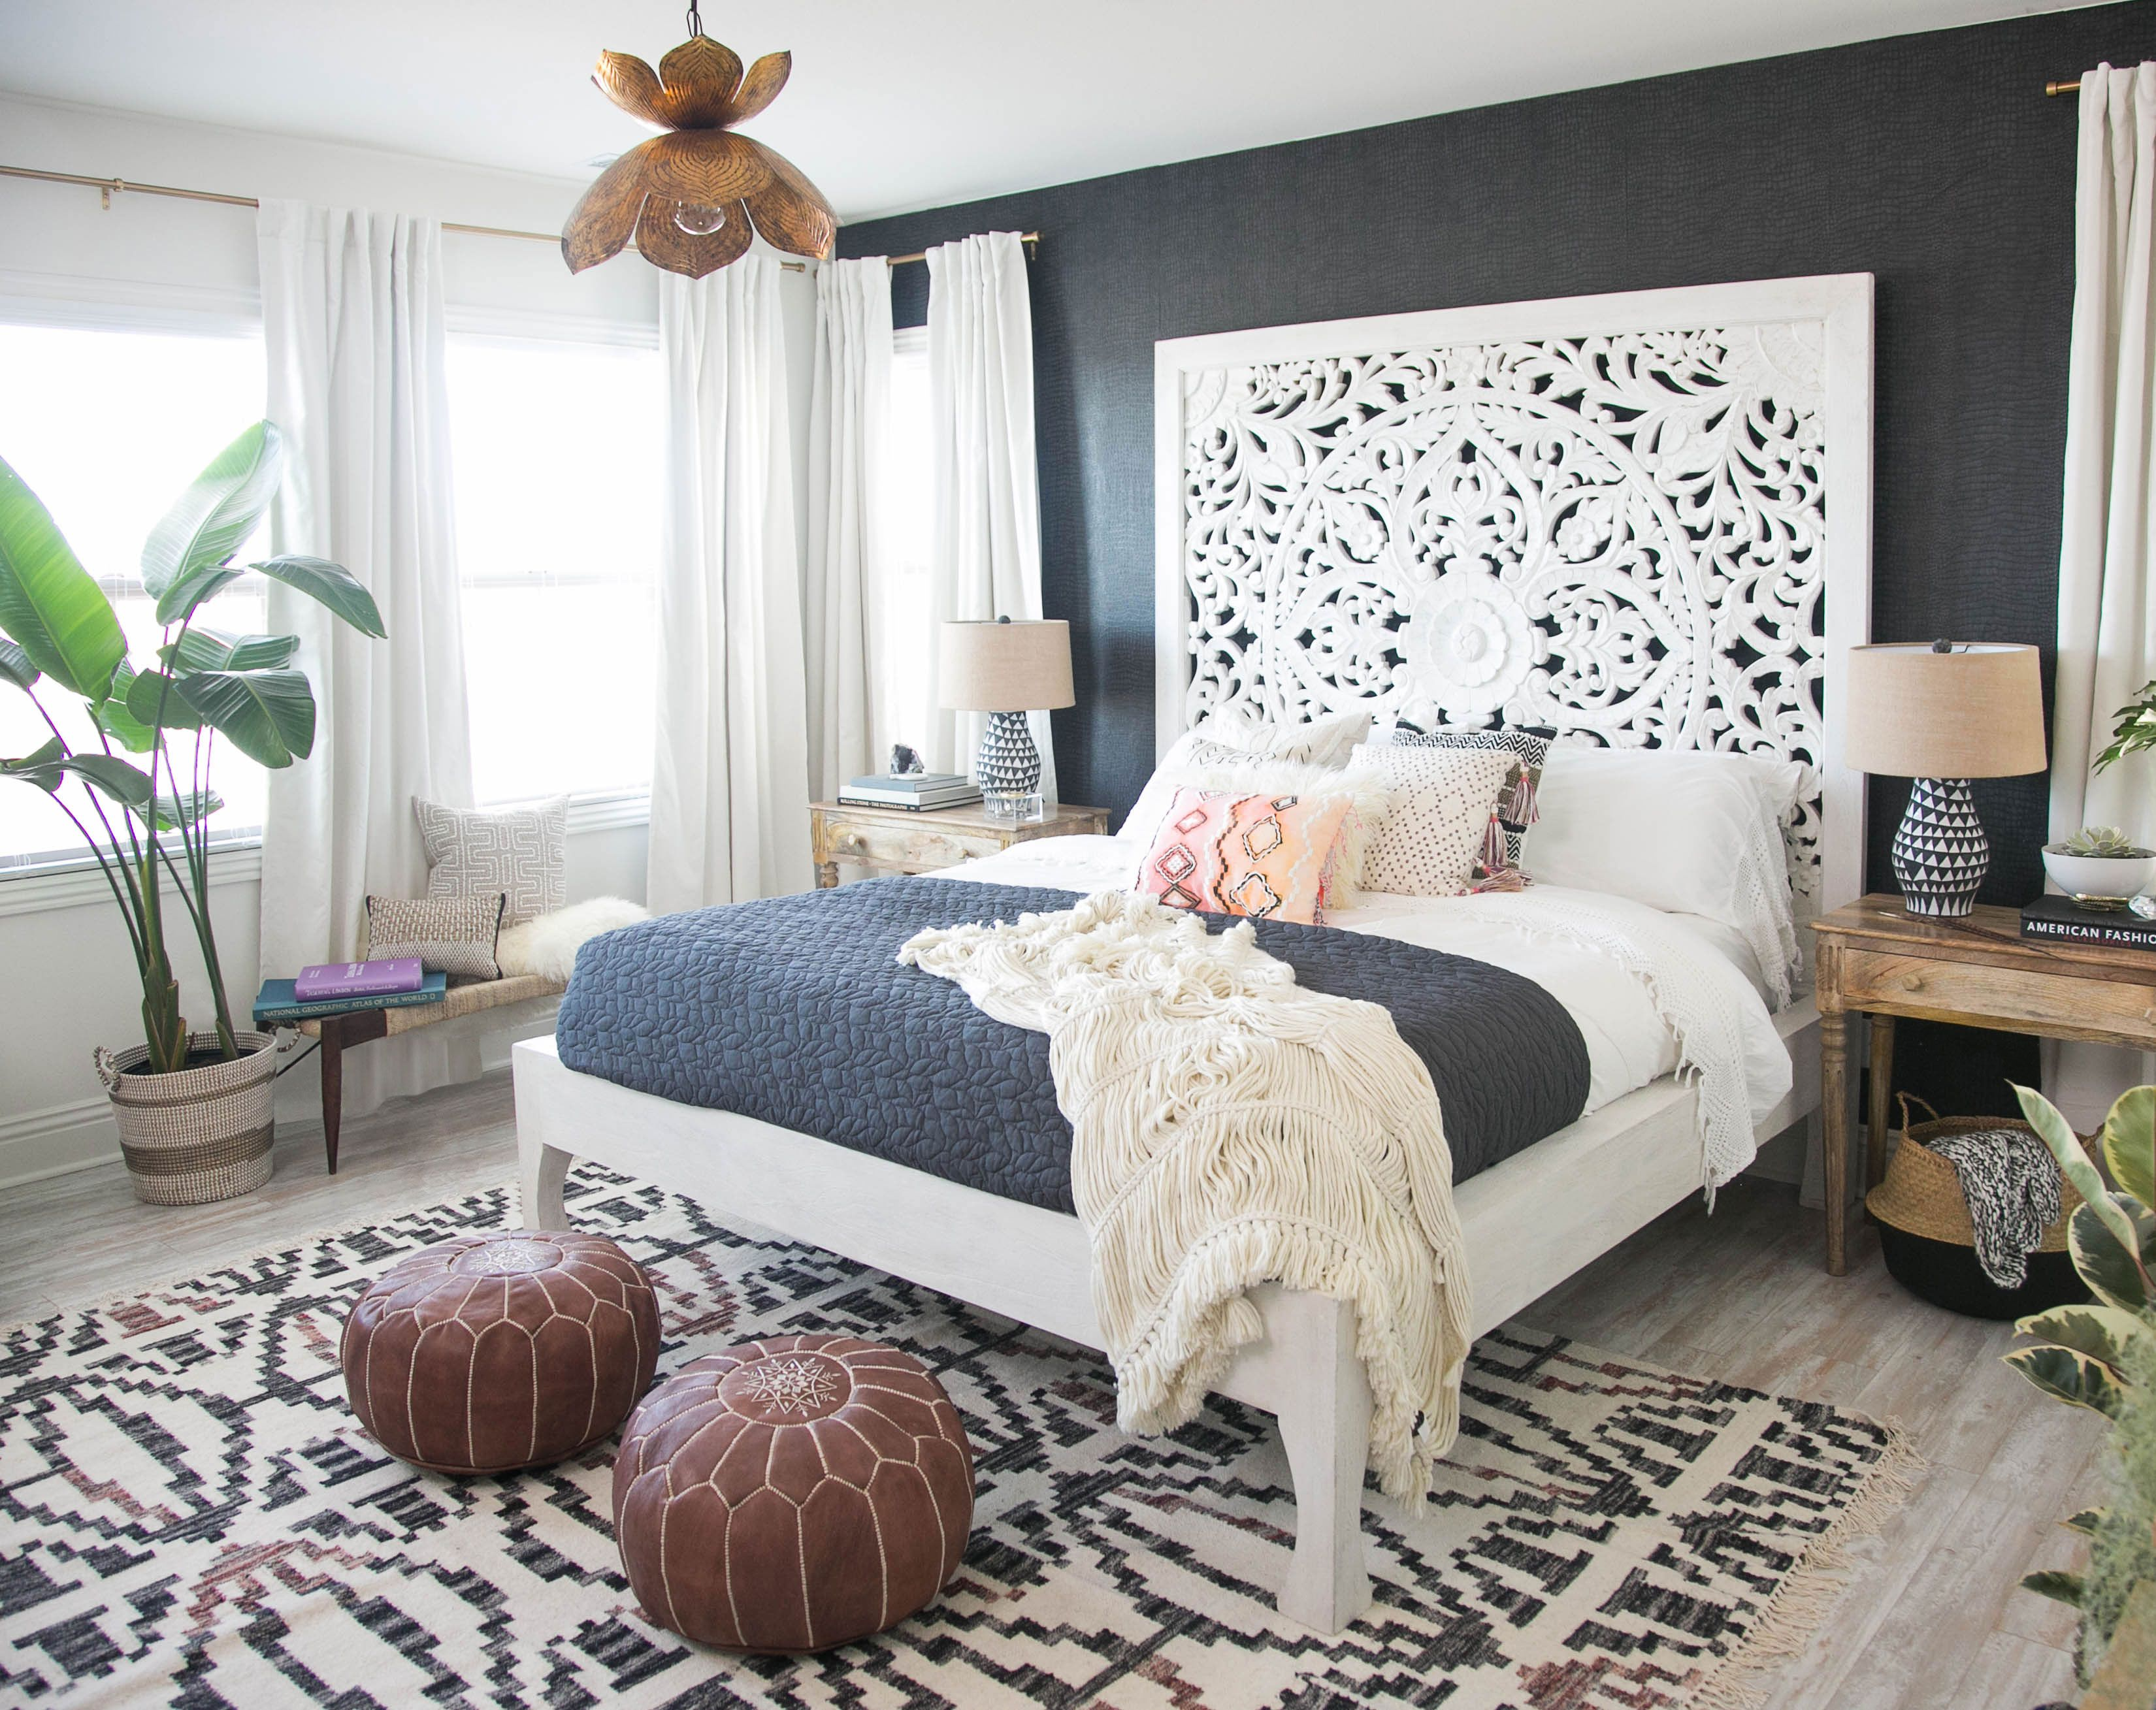 Kleuren Slaapkamer Jeugd : Saturated palette future home!! pinterest hoofdbord bed